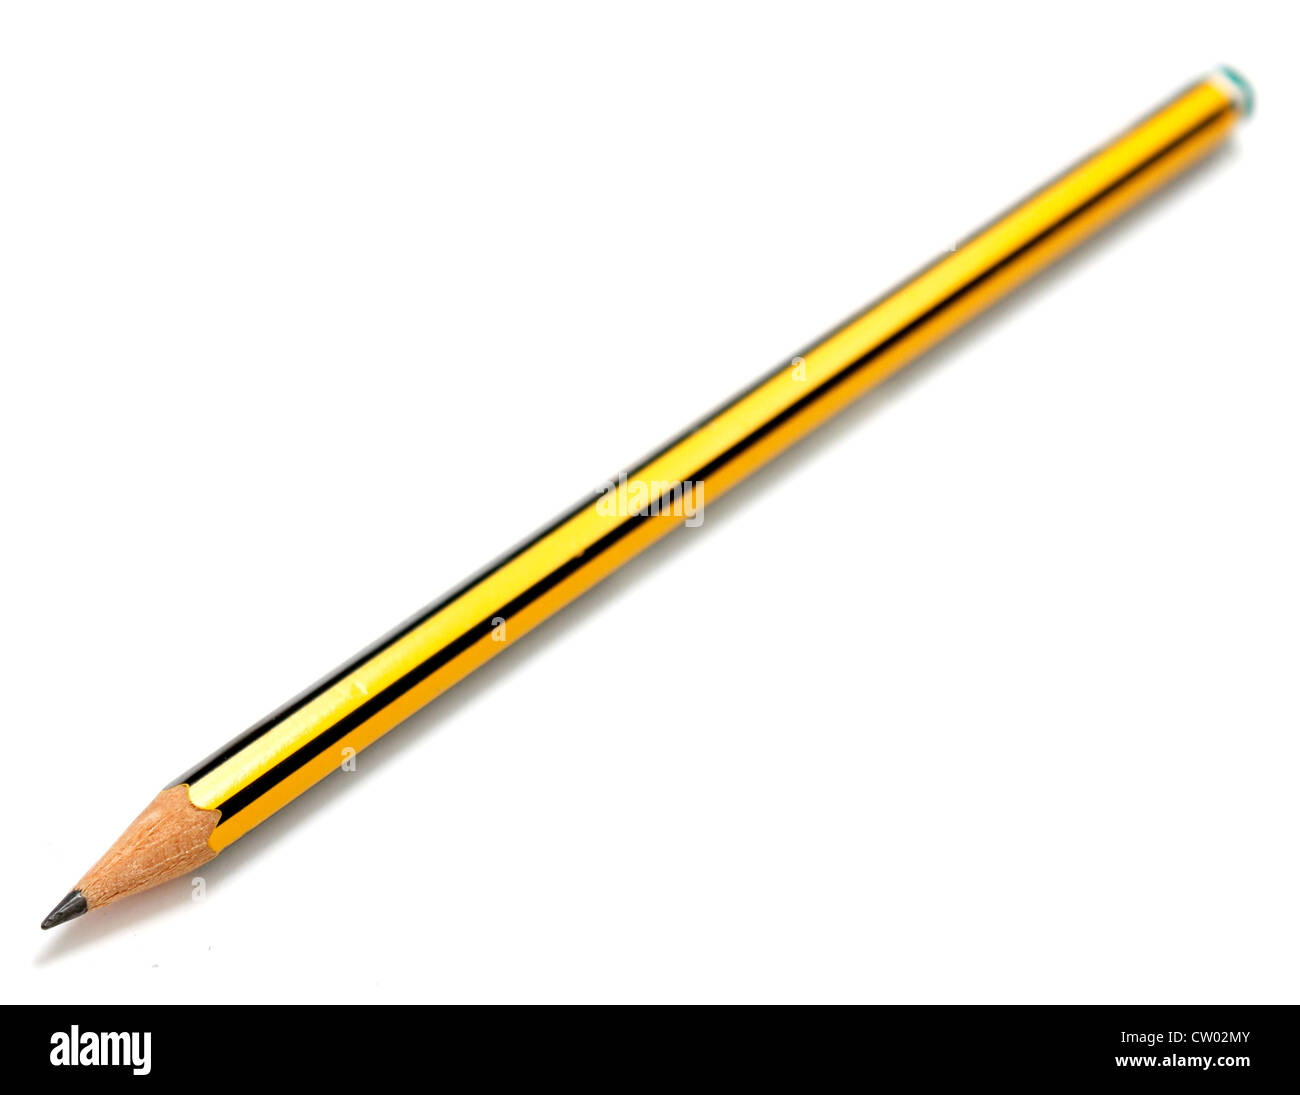 Pencil - Stock Image